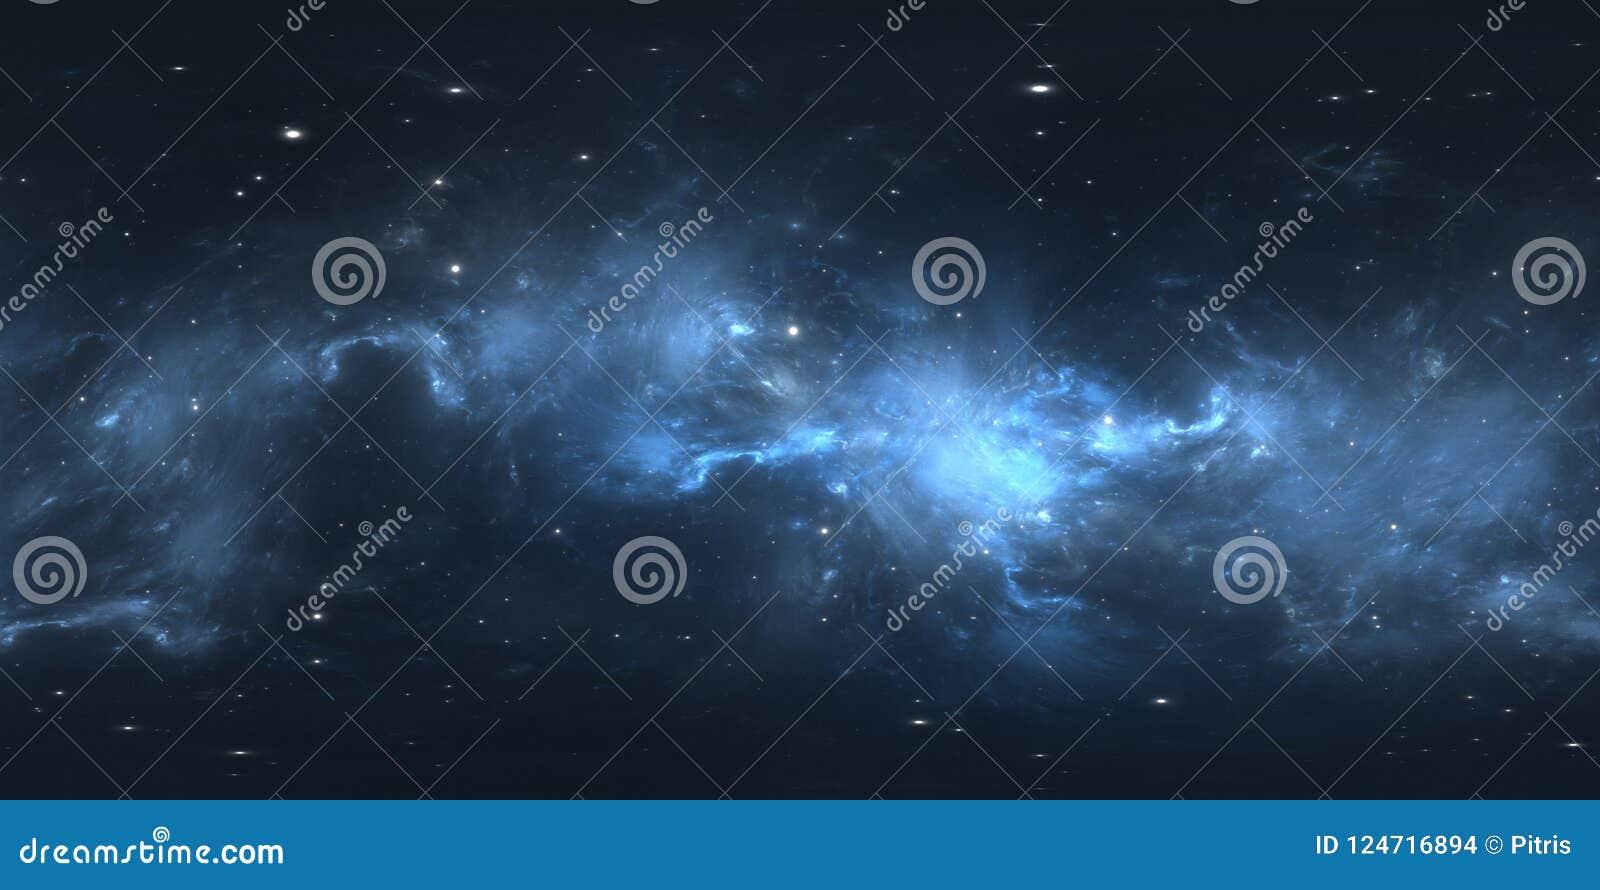 360 Degree Space Nebula Panorama, Equirectangular Projection